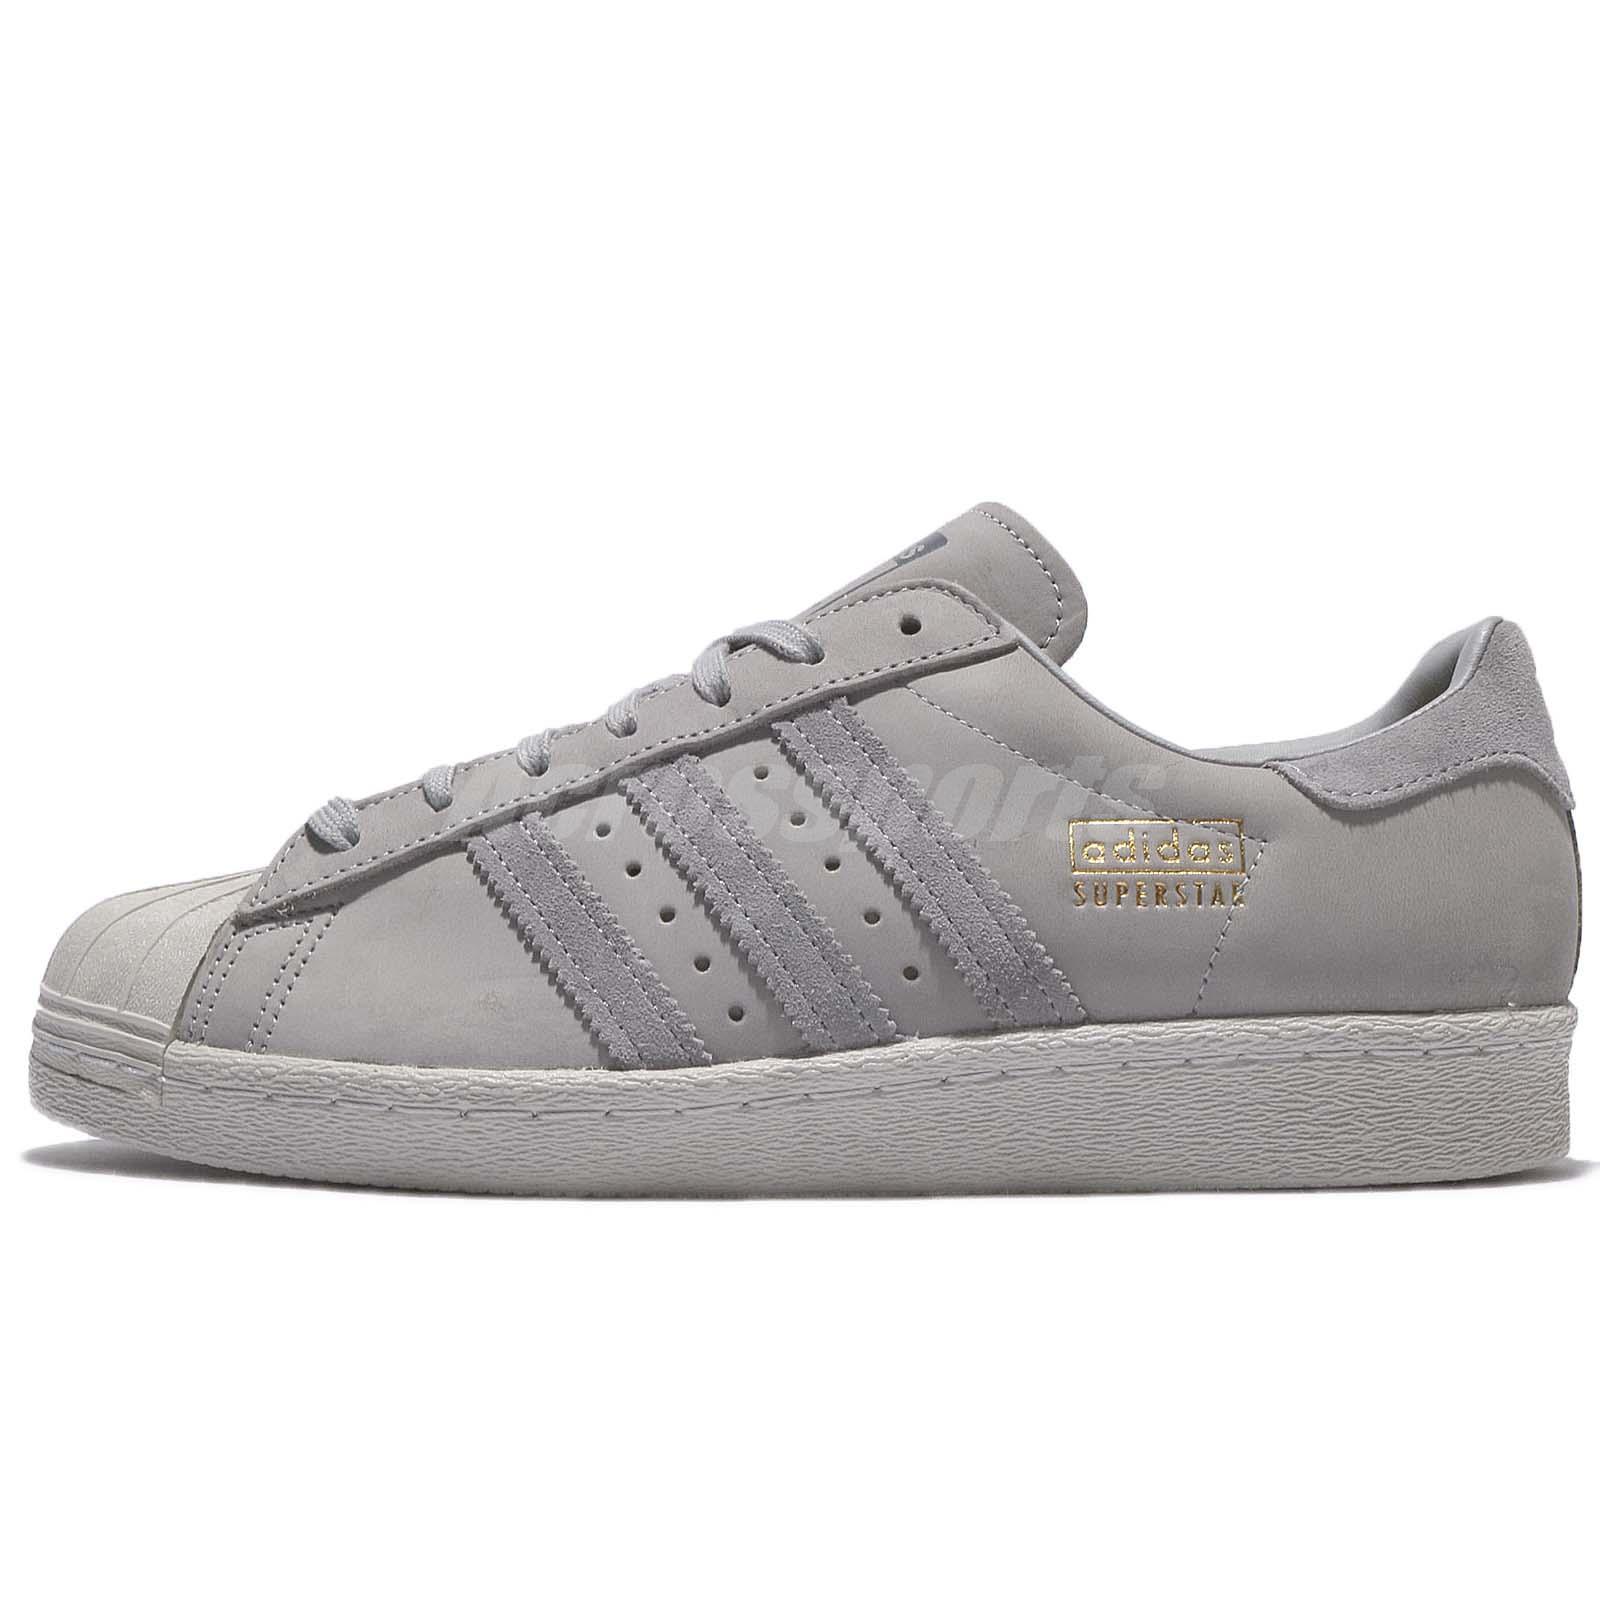 adidas Originals Superstar 80s Mid Grey Leather Men Shoes Sneaker Trainer  BZ0208